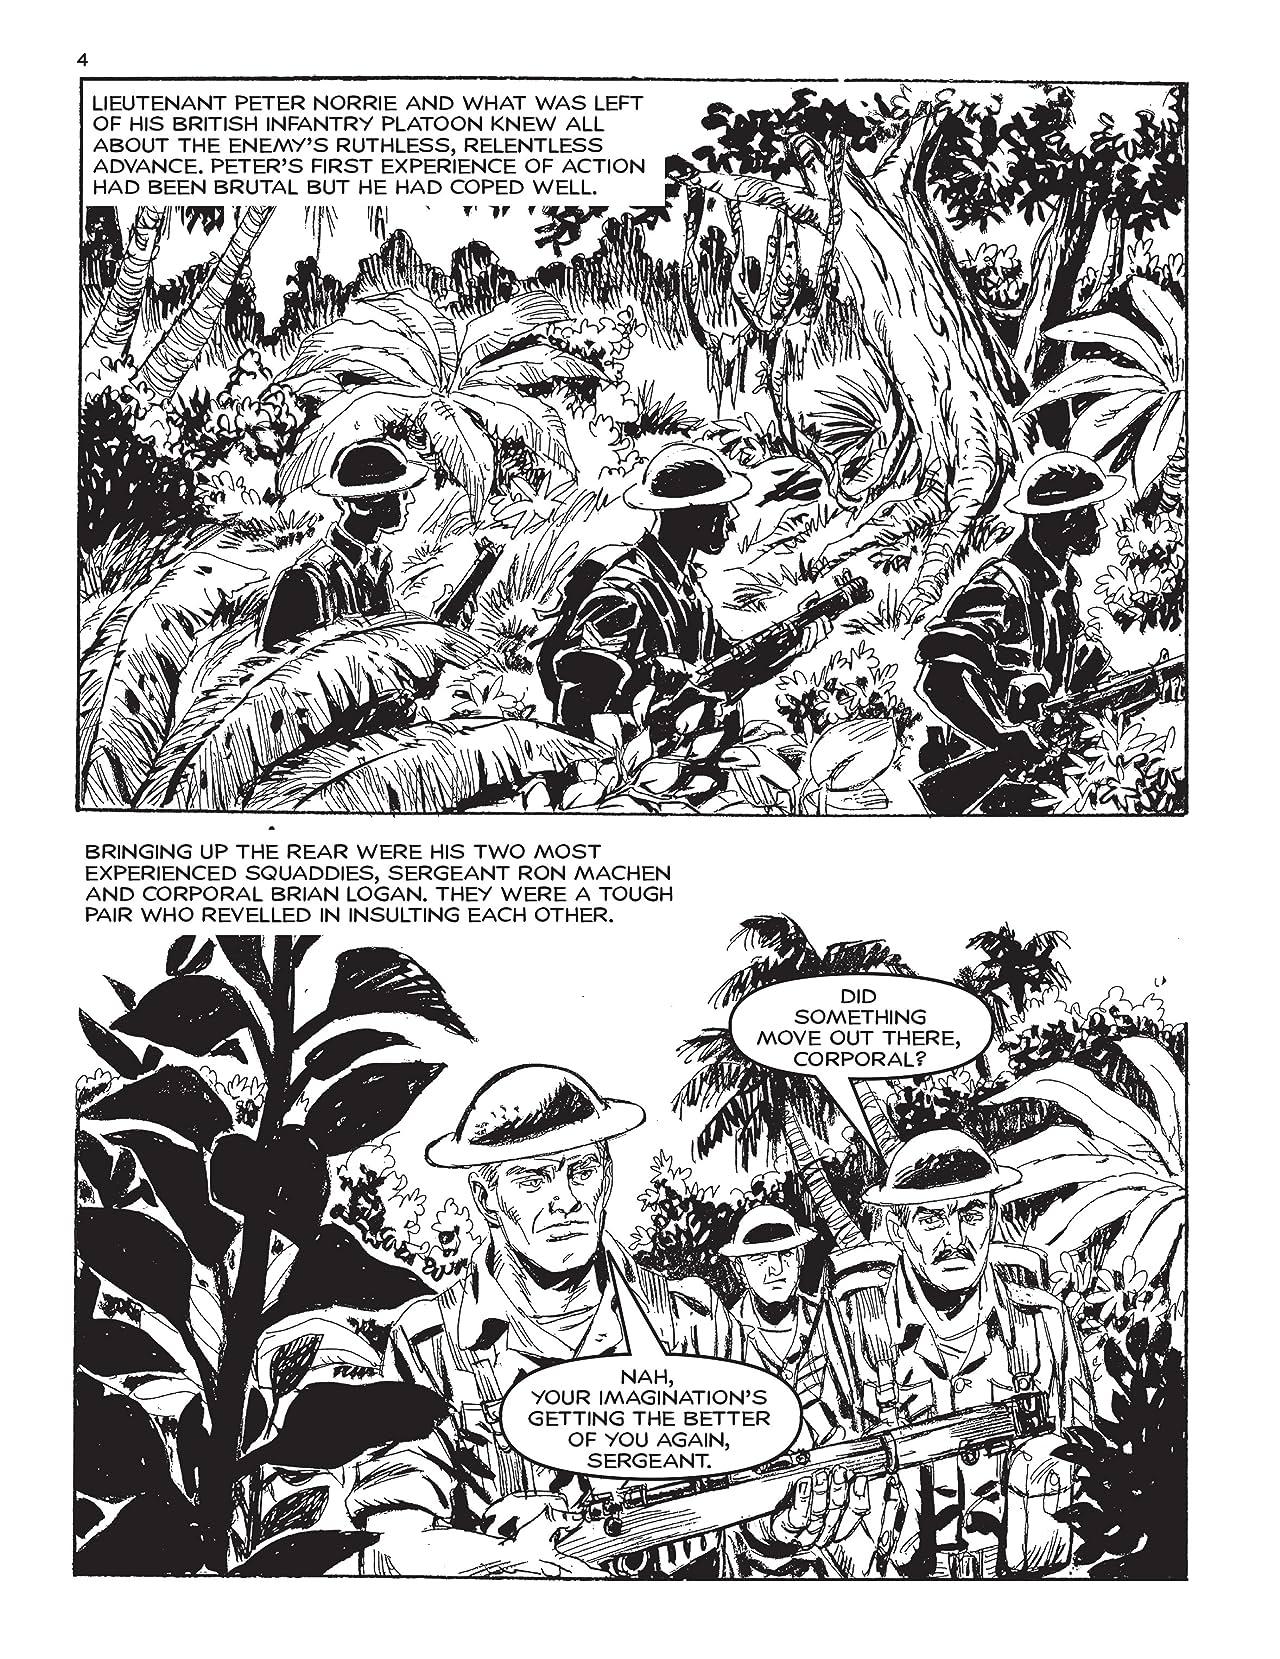 Commando #4899: Massacre In Malaya